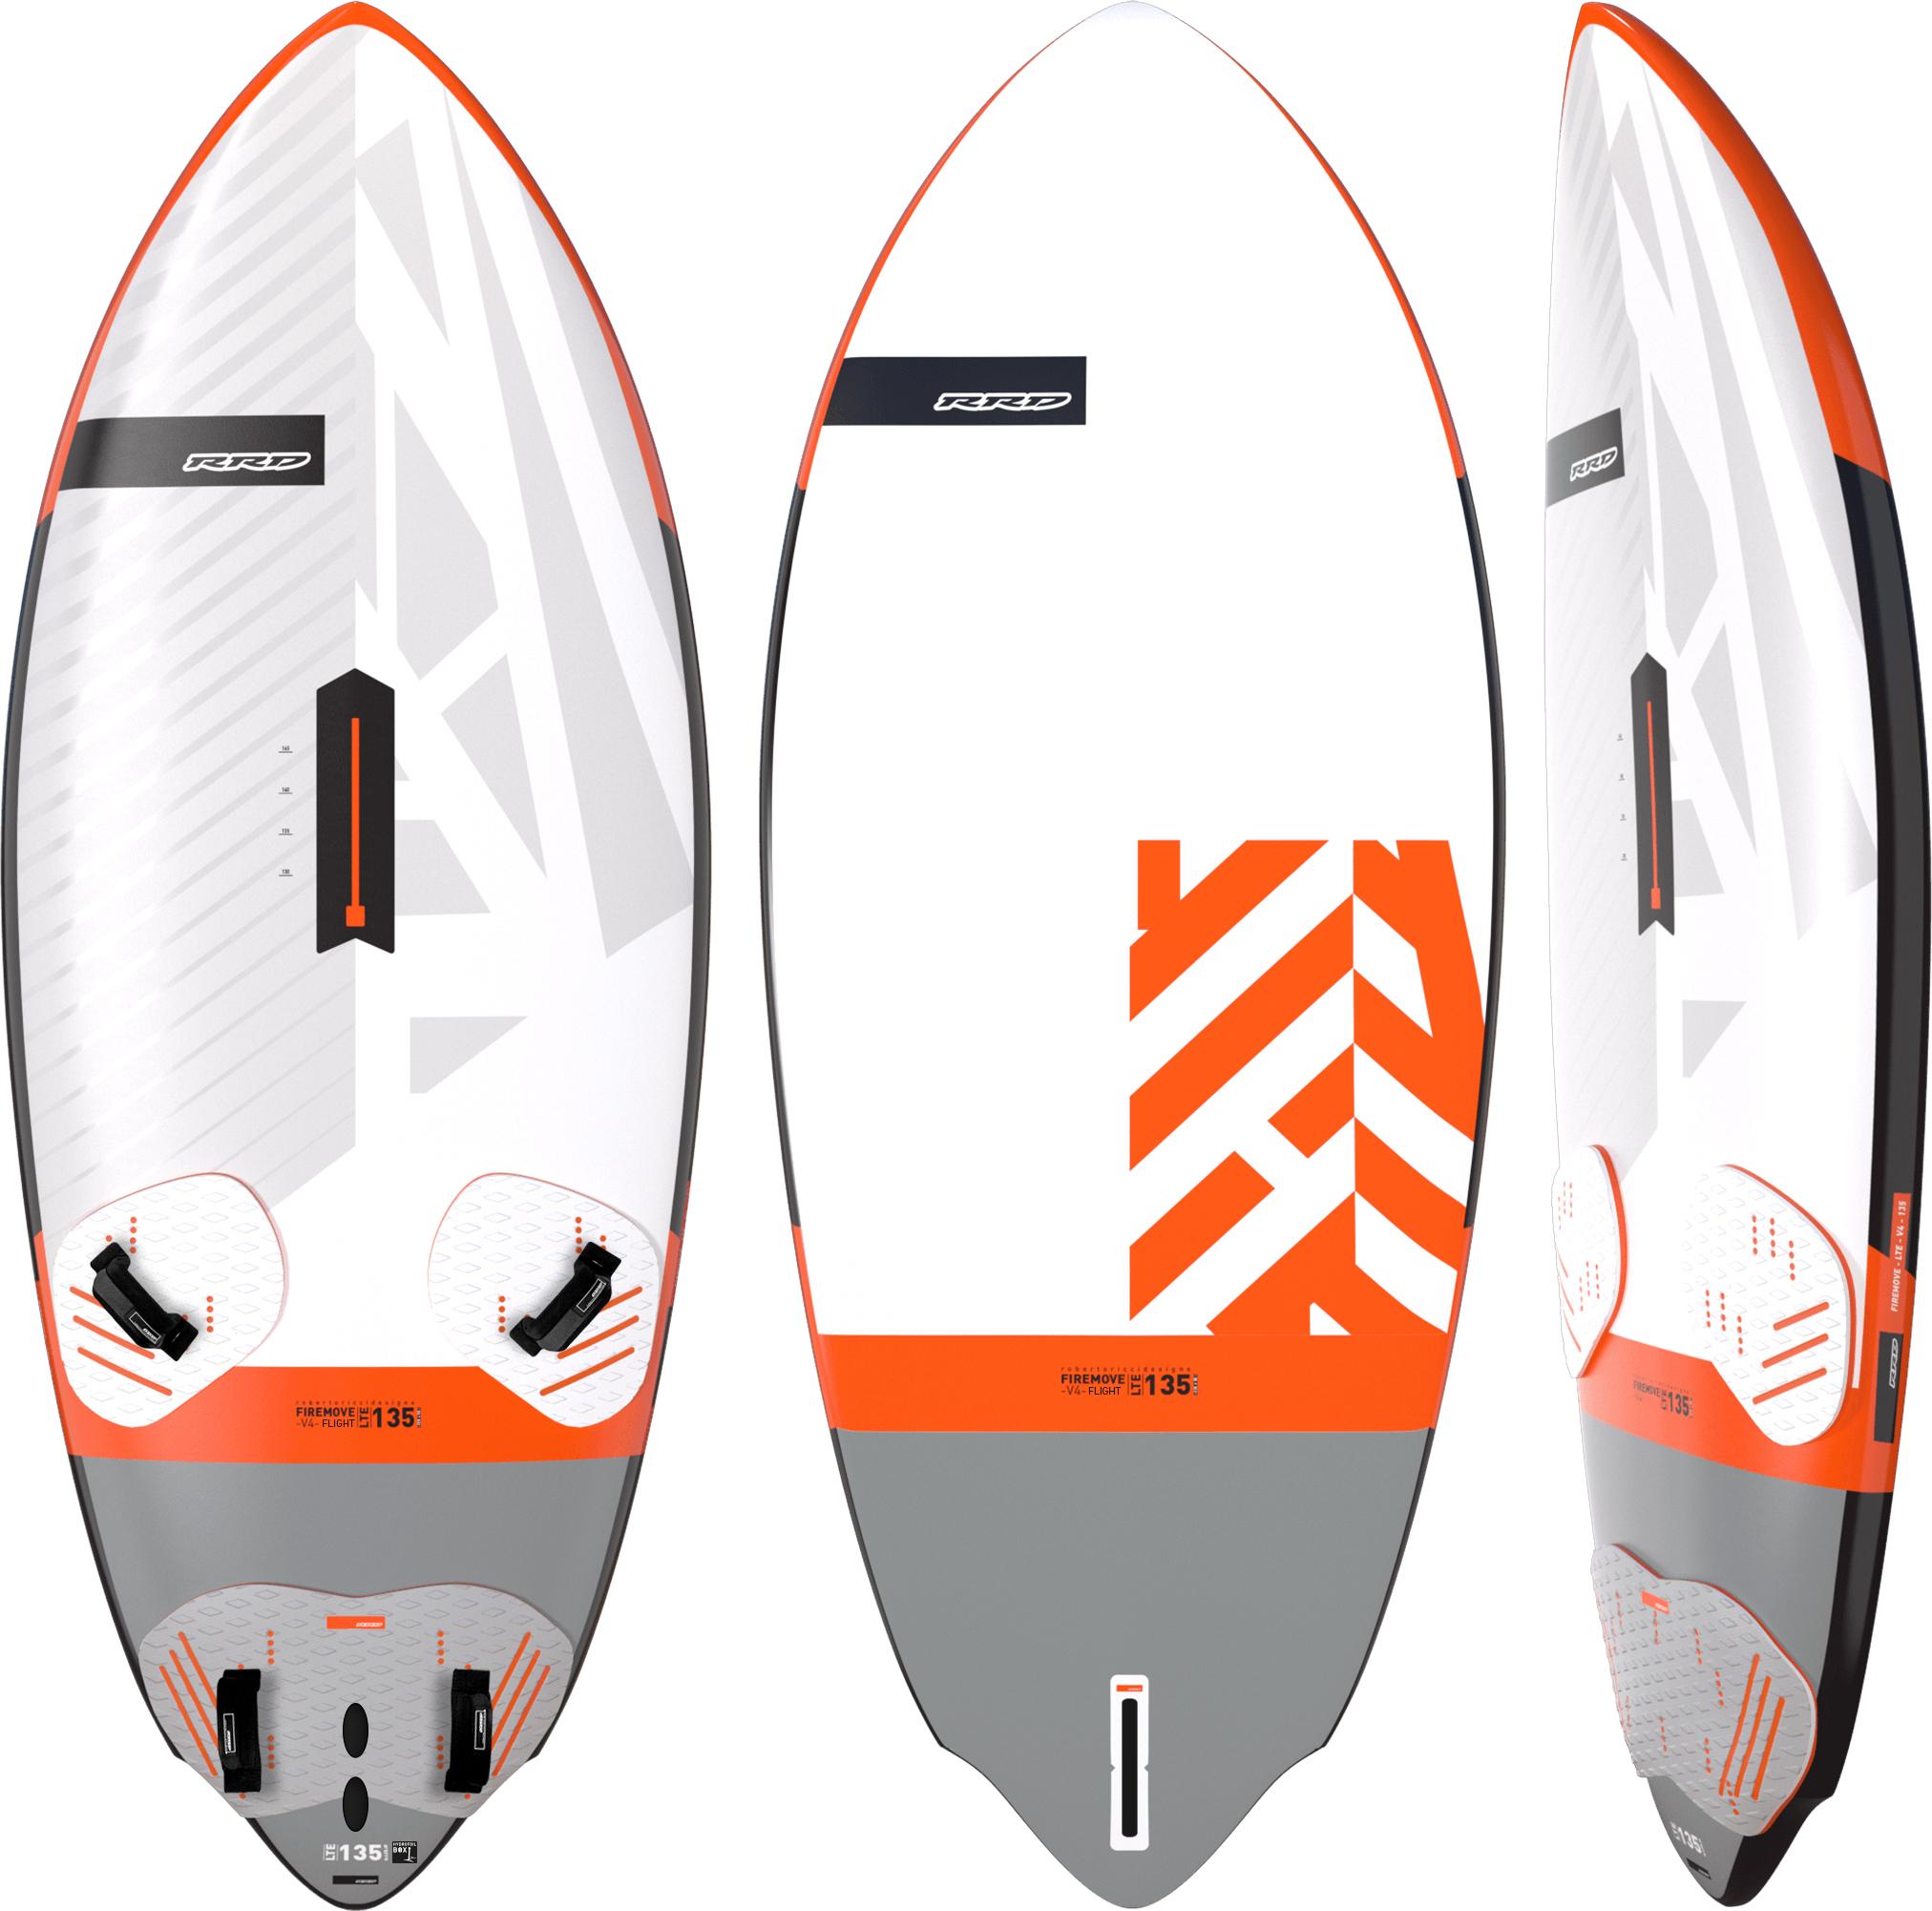 Firemove V4 LTE Flight Foil Windsurfboard RRD 2019